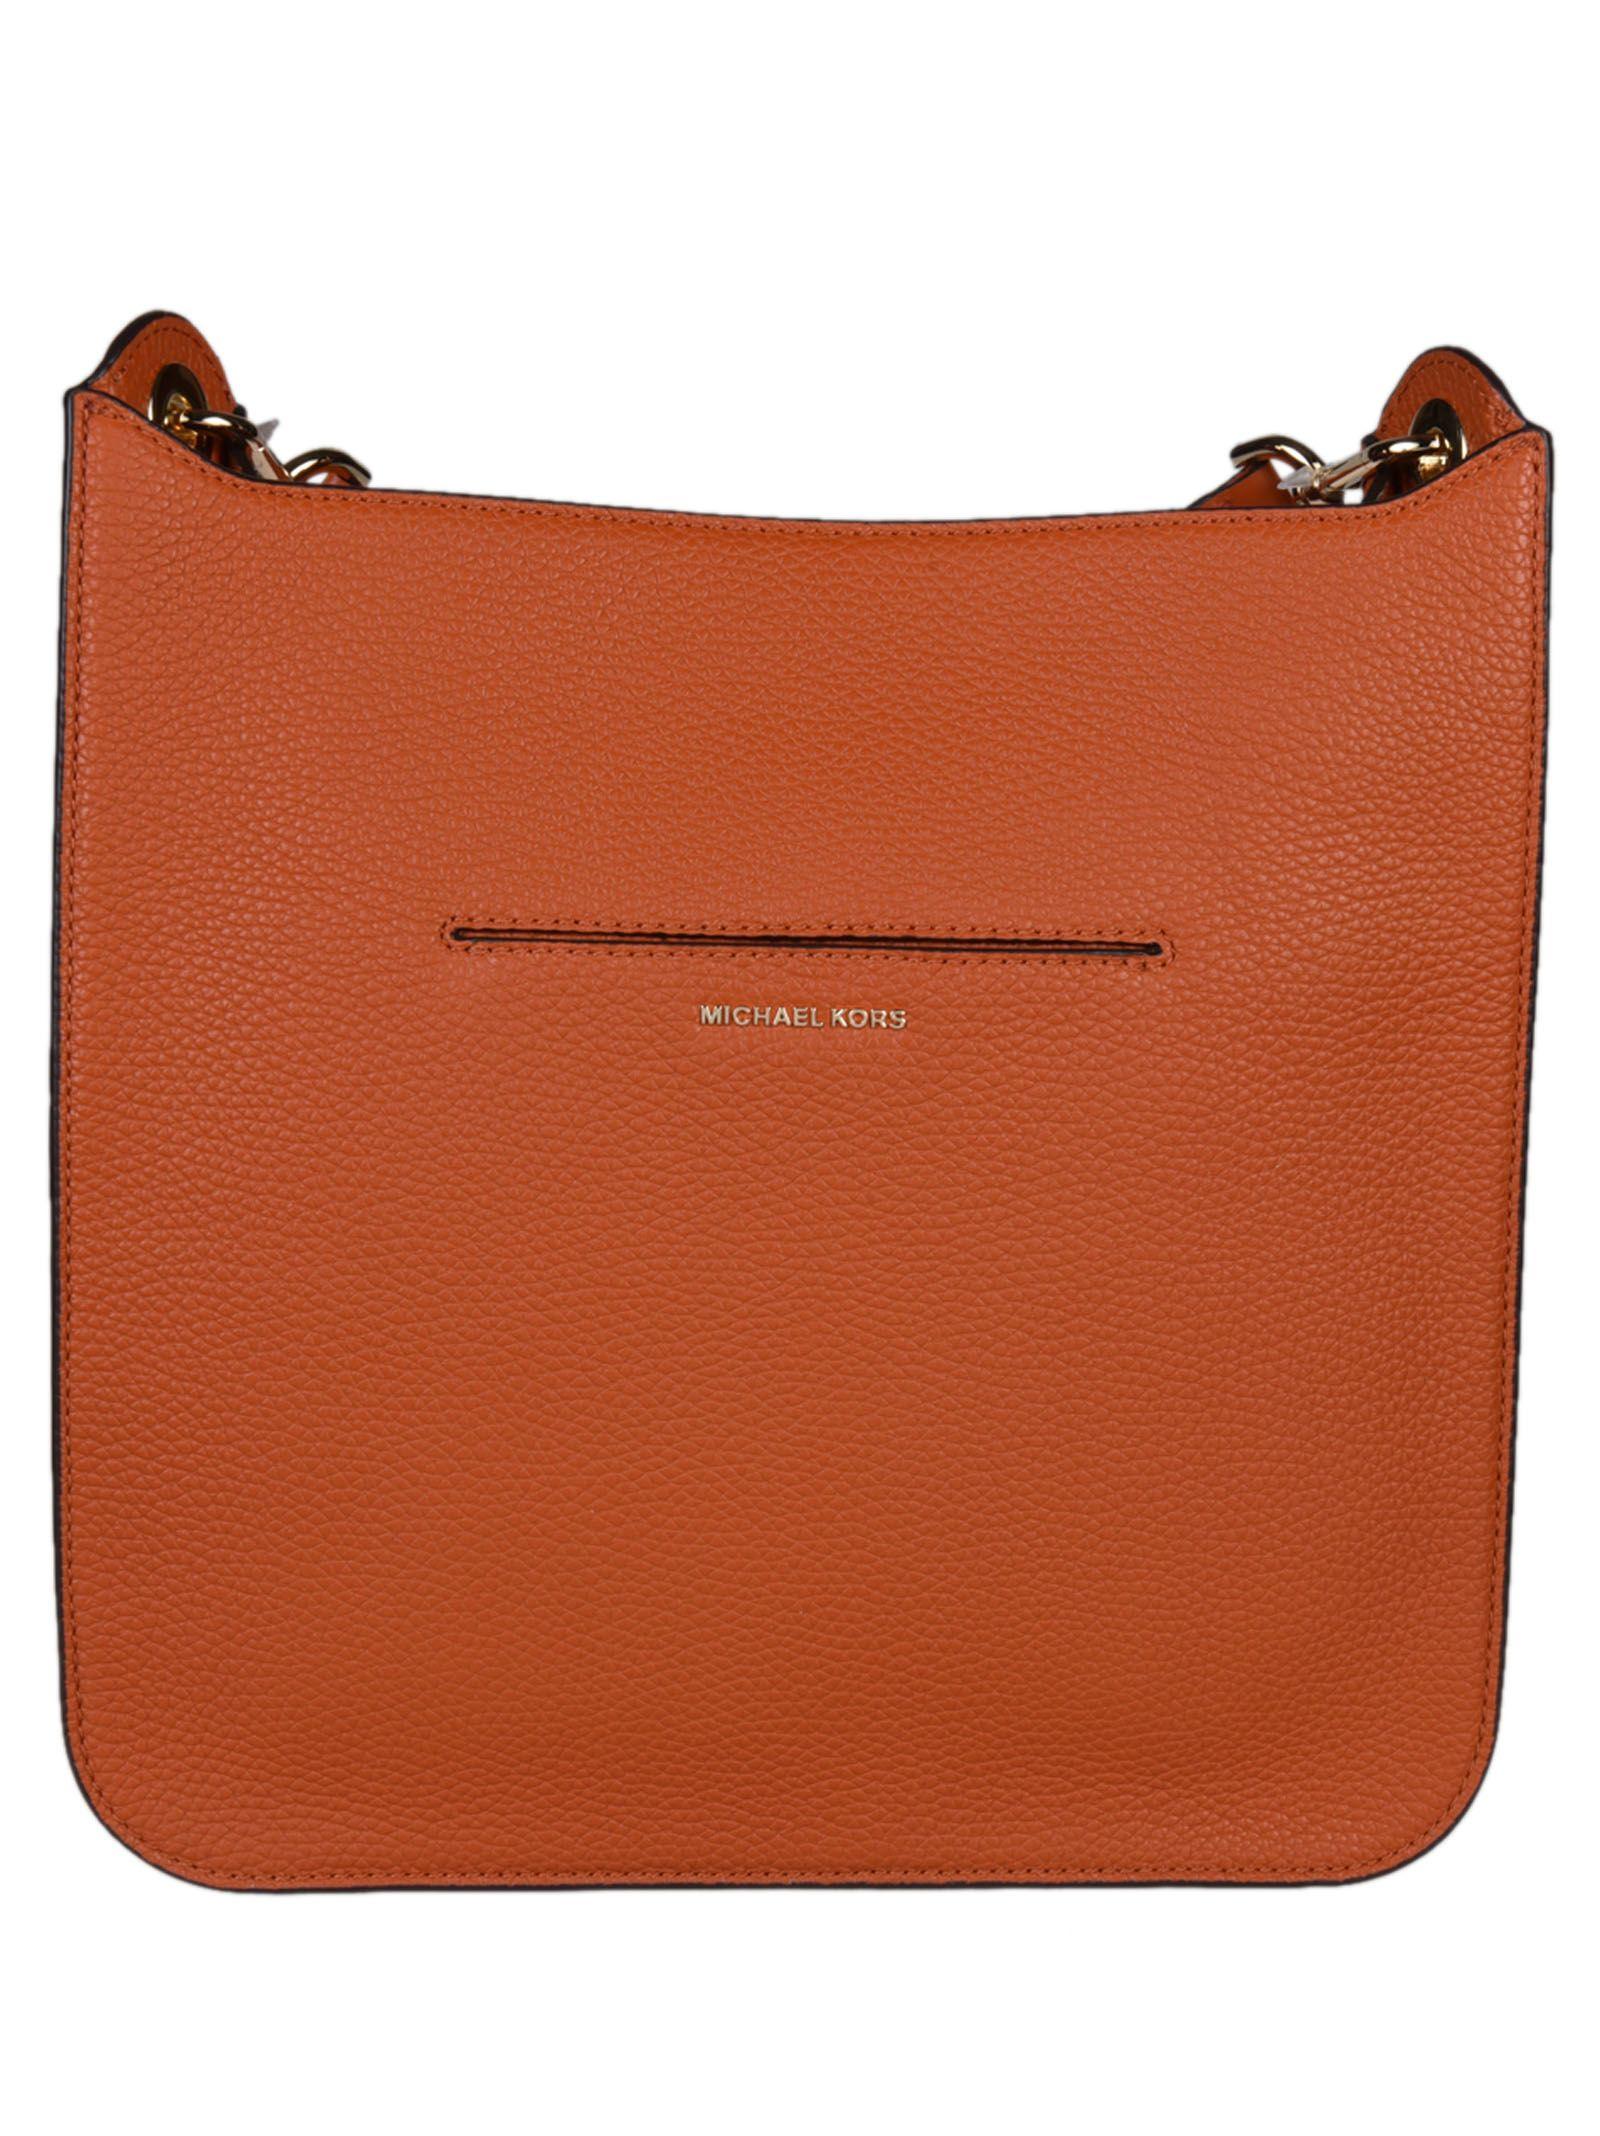 5275e1a67e6b Michael Kors Sullivan Large North South Messenger Shoulder Bag - Orange ...